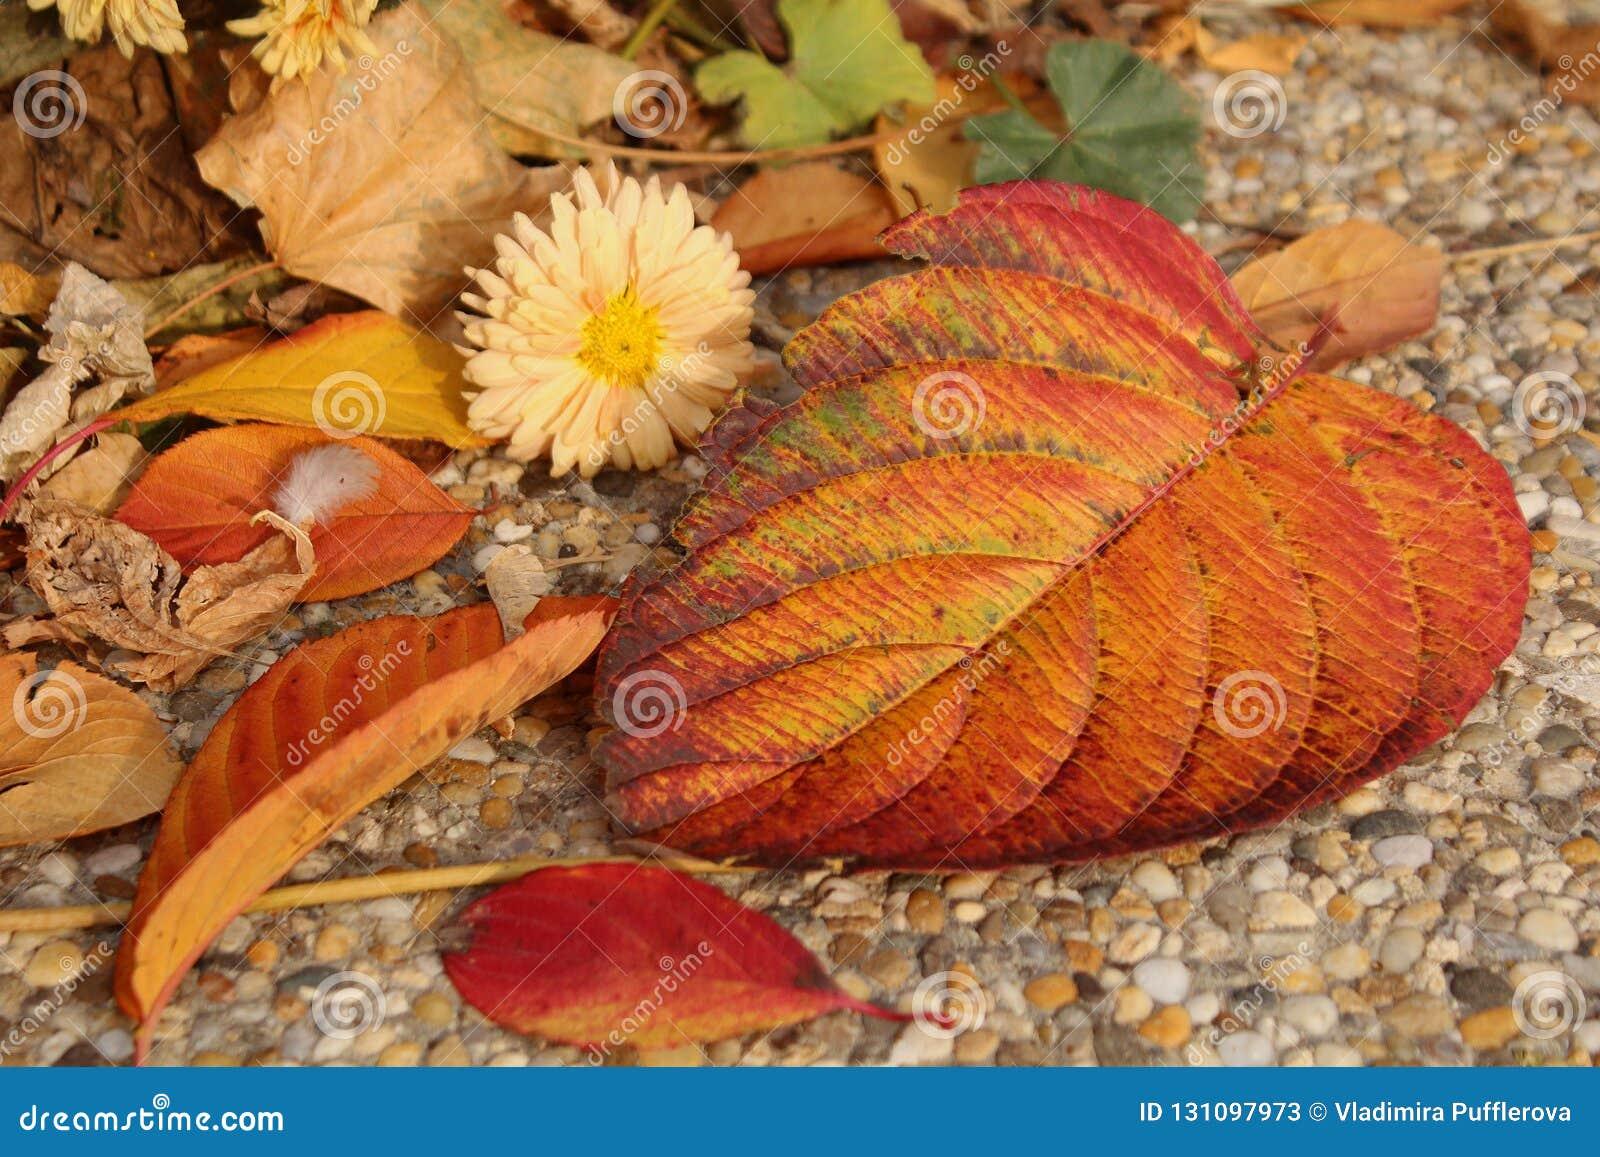 Orange fallen leaves and autumn flowers